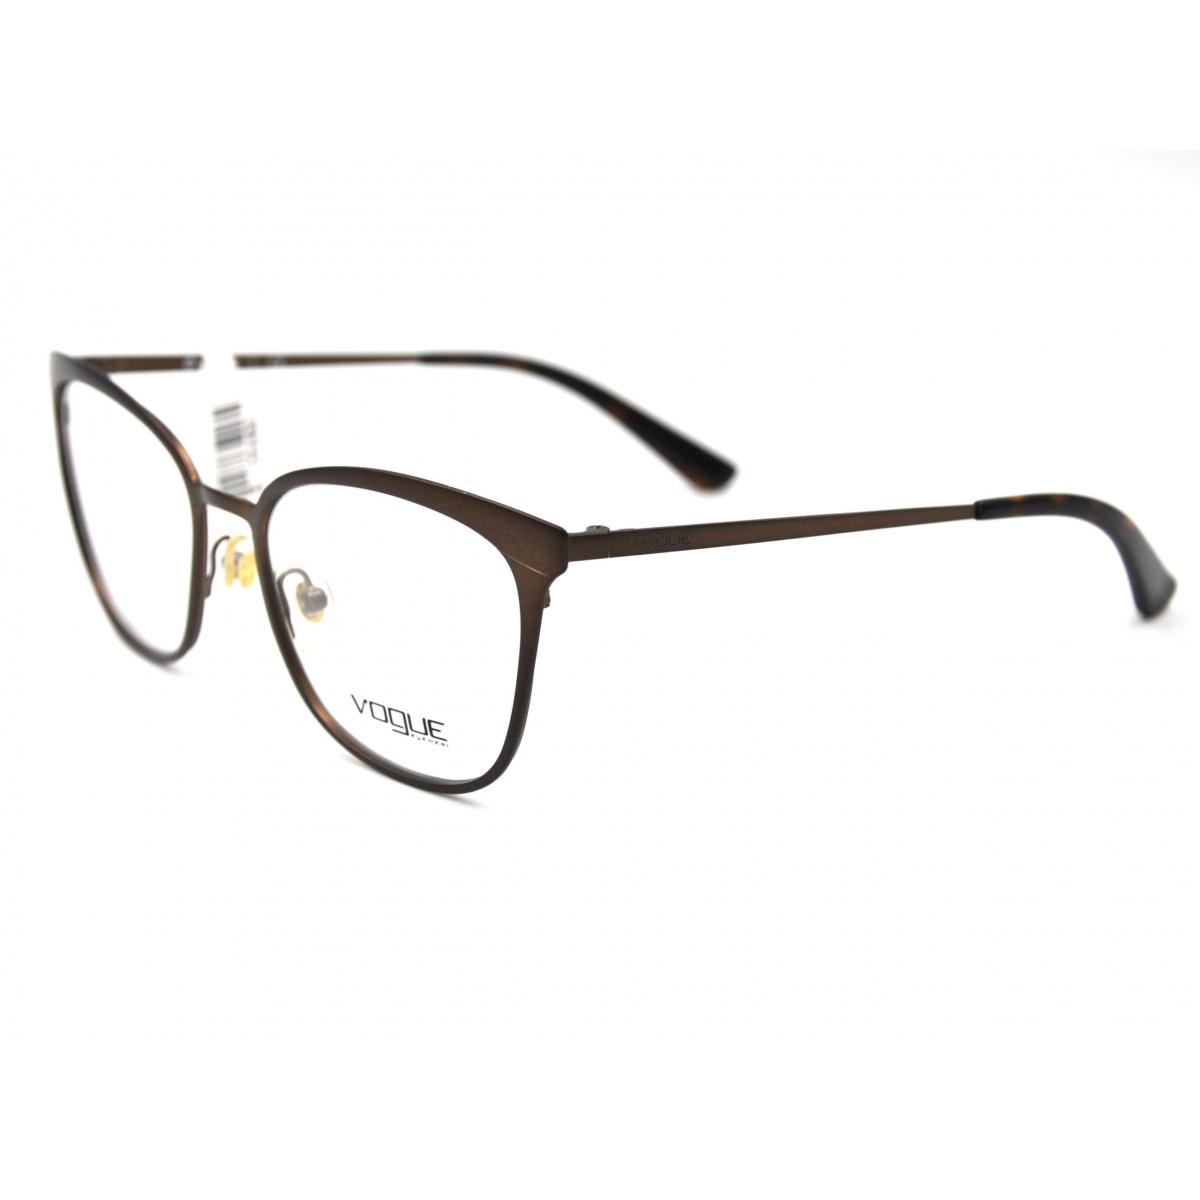 VOGUE VO3999 934-S Prescription Glasses 2019